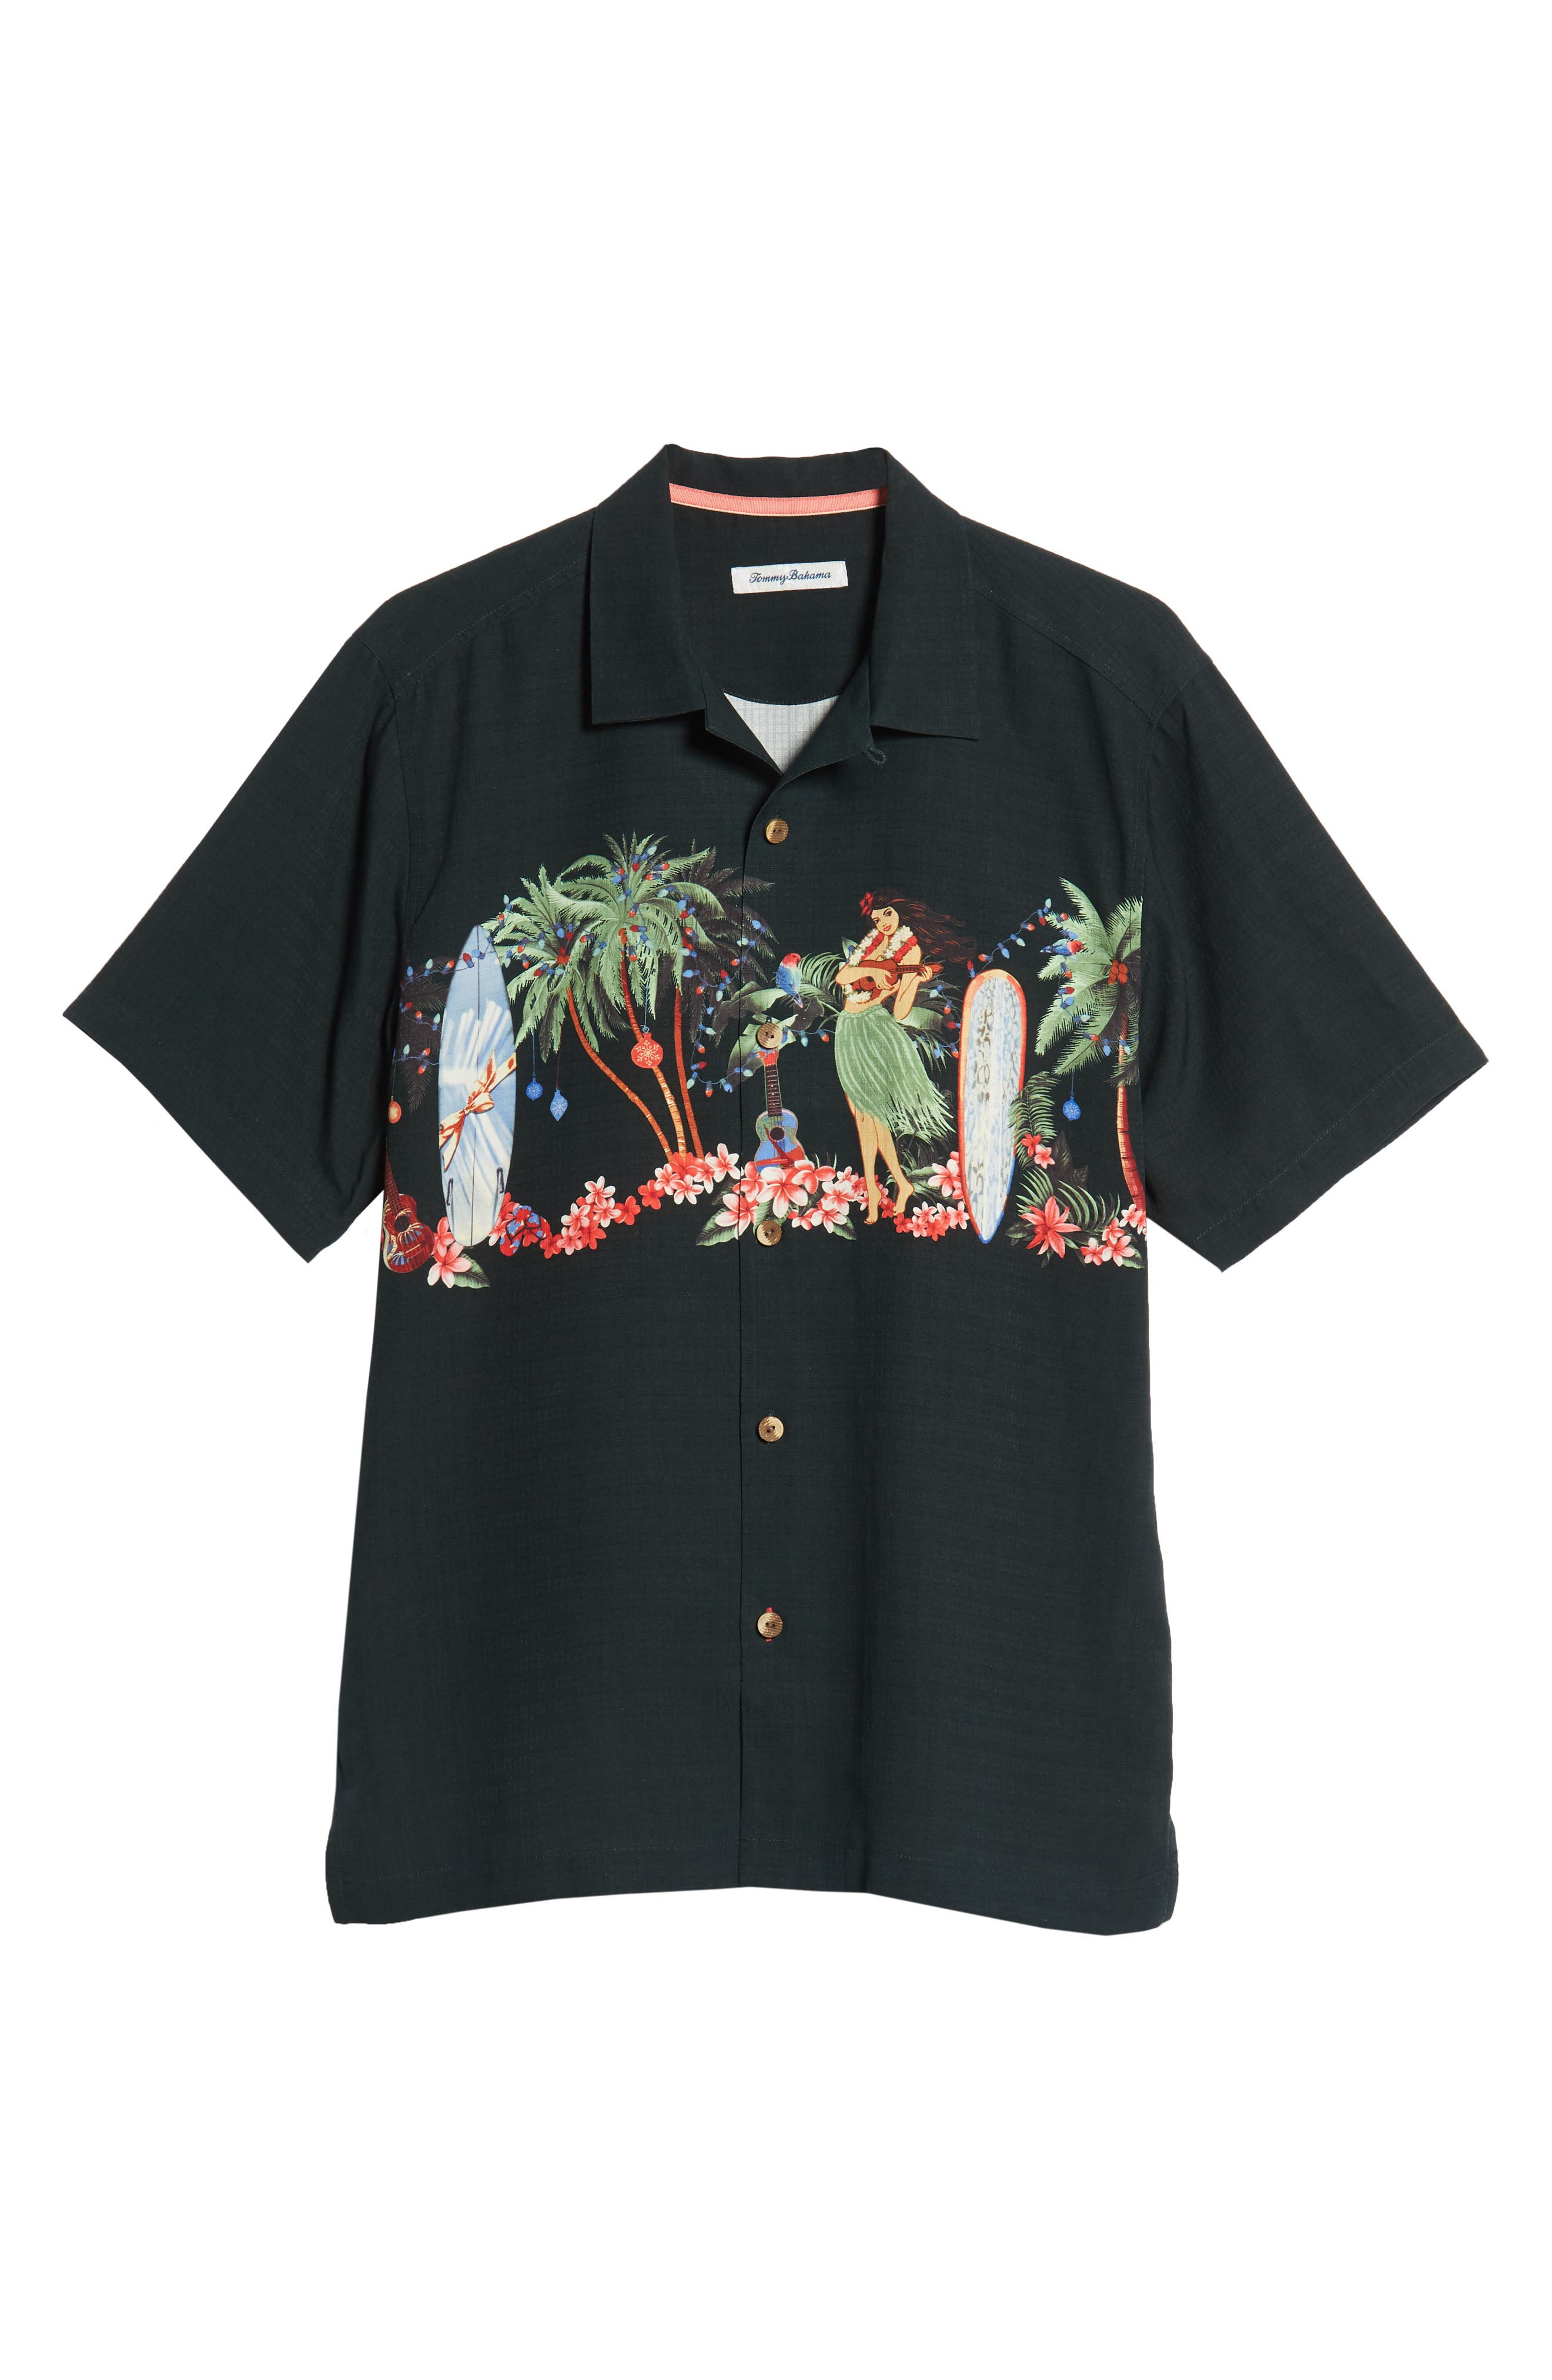 Mele Kalikimaka Silk Camp Shirt,                             Alternate thumbnail 5, color,                             BLACK